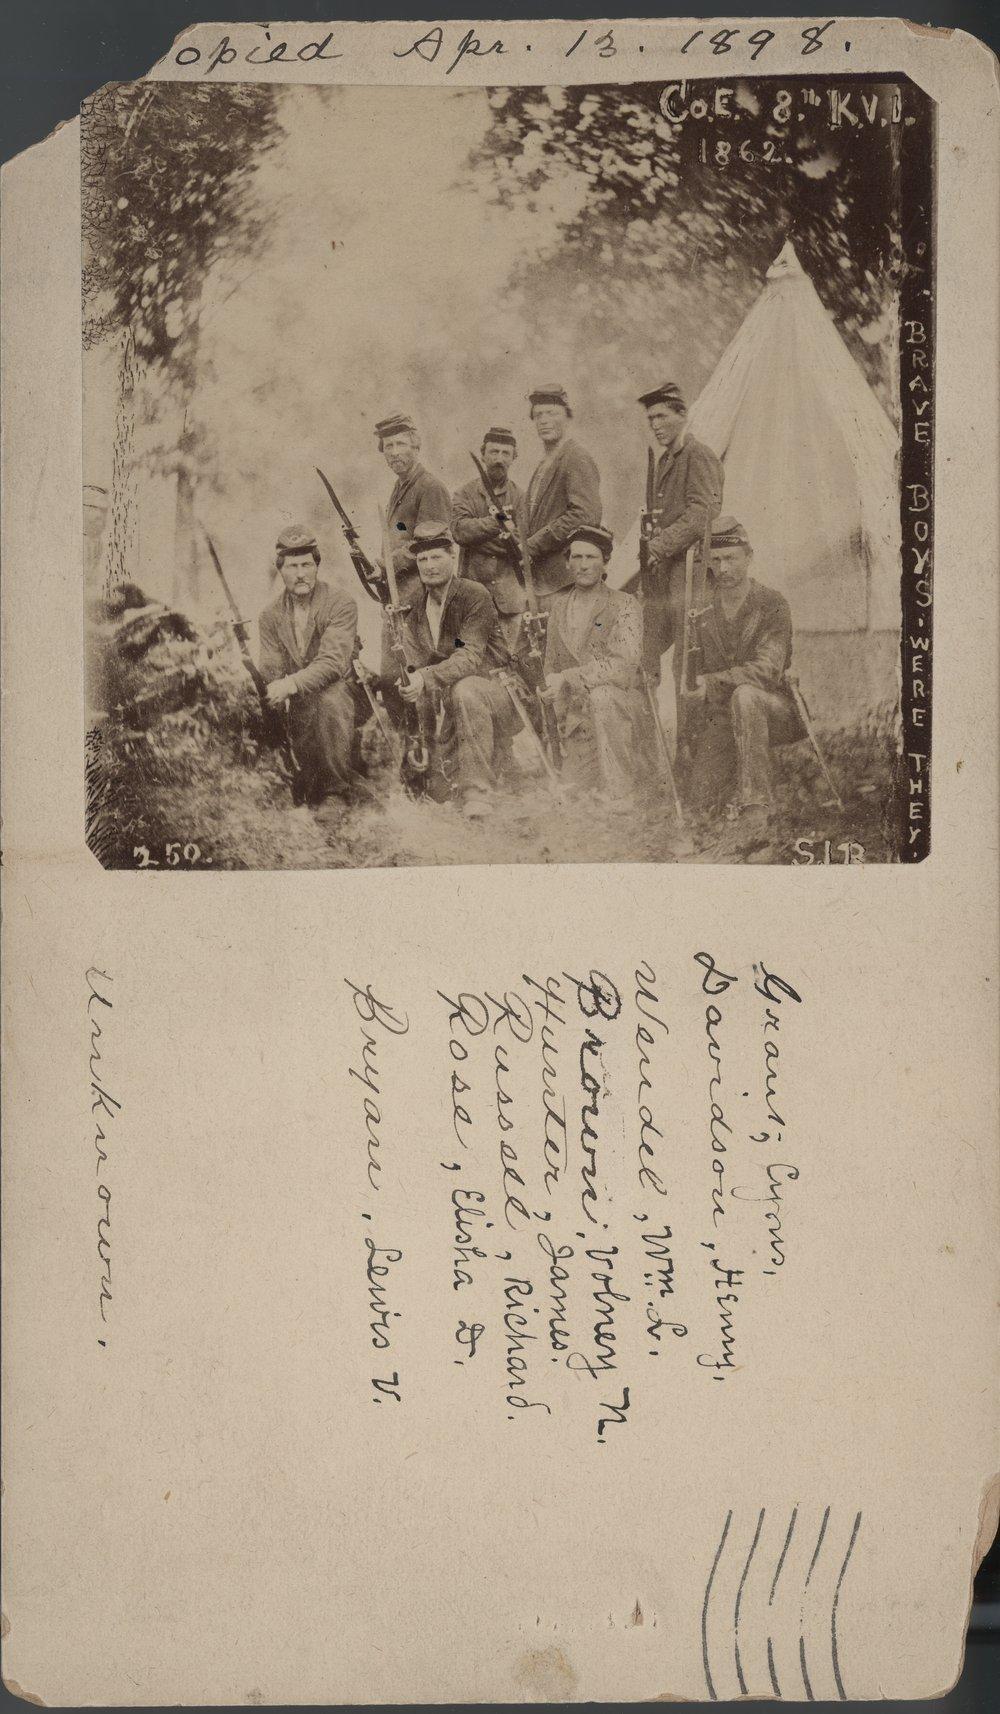 8th Kansas Volunteer Infantry - 1